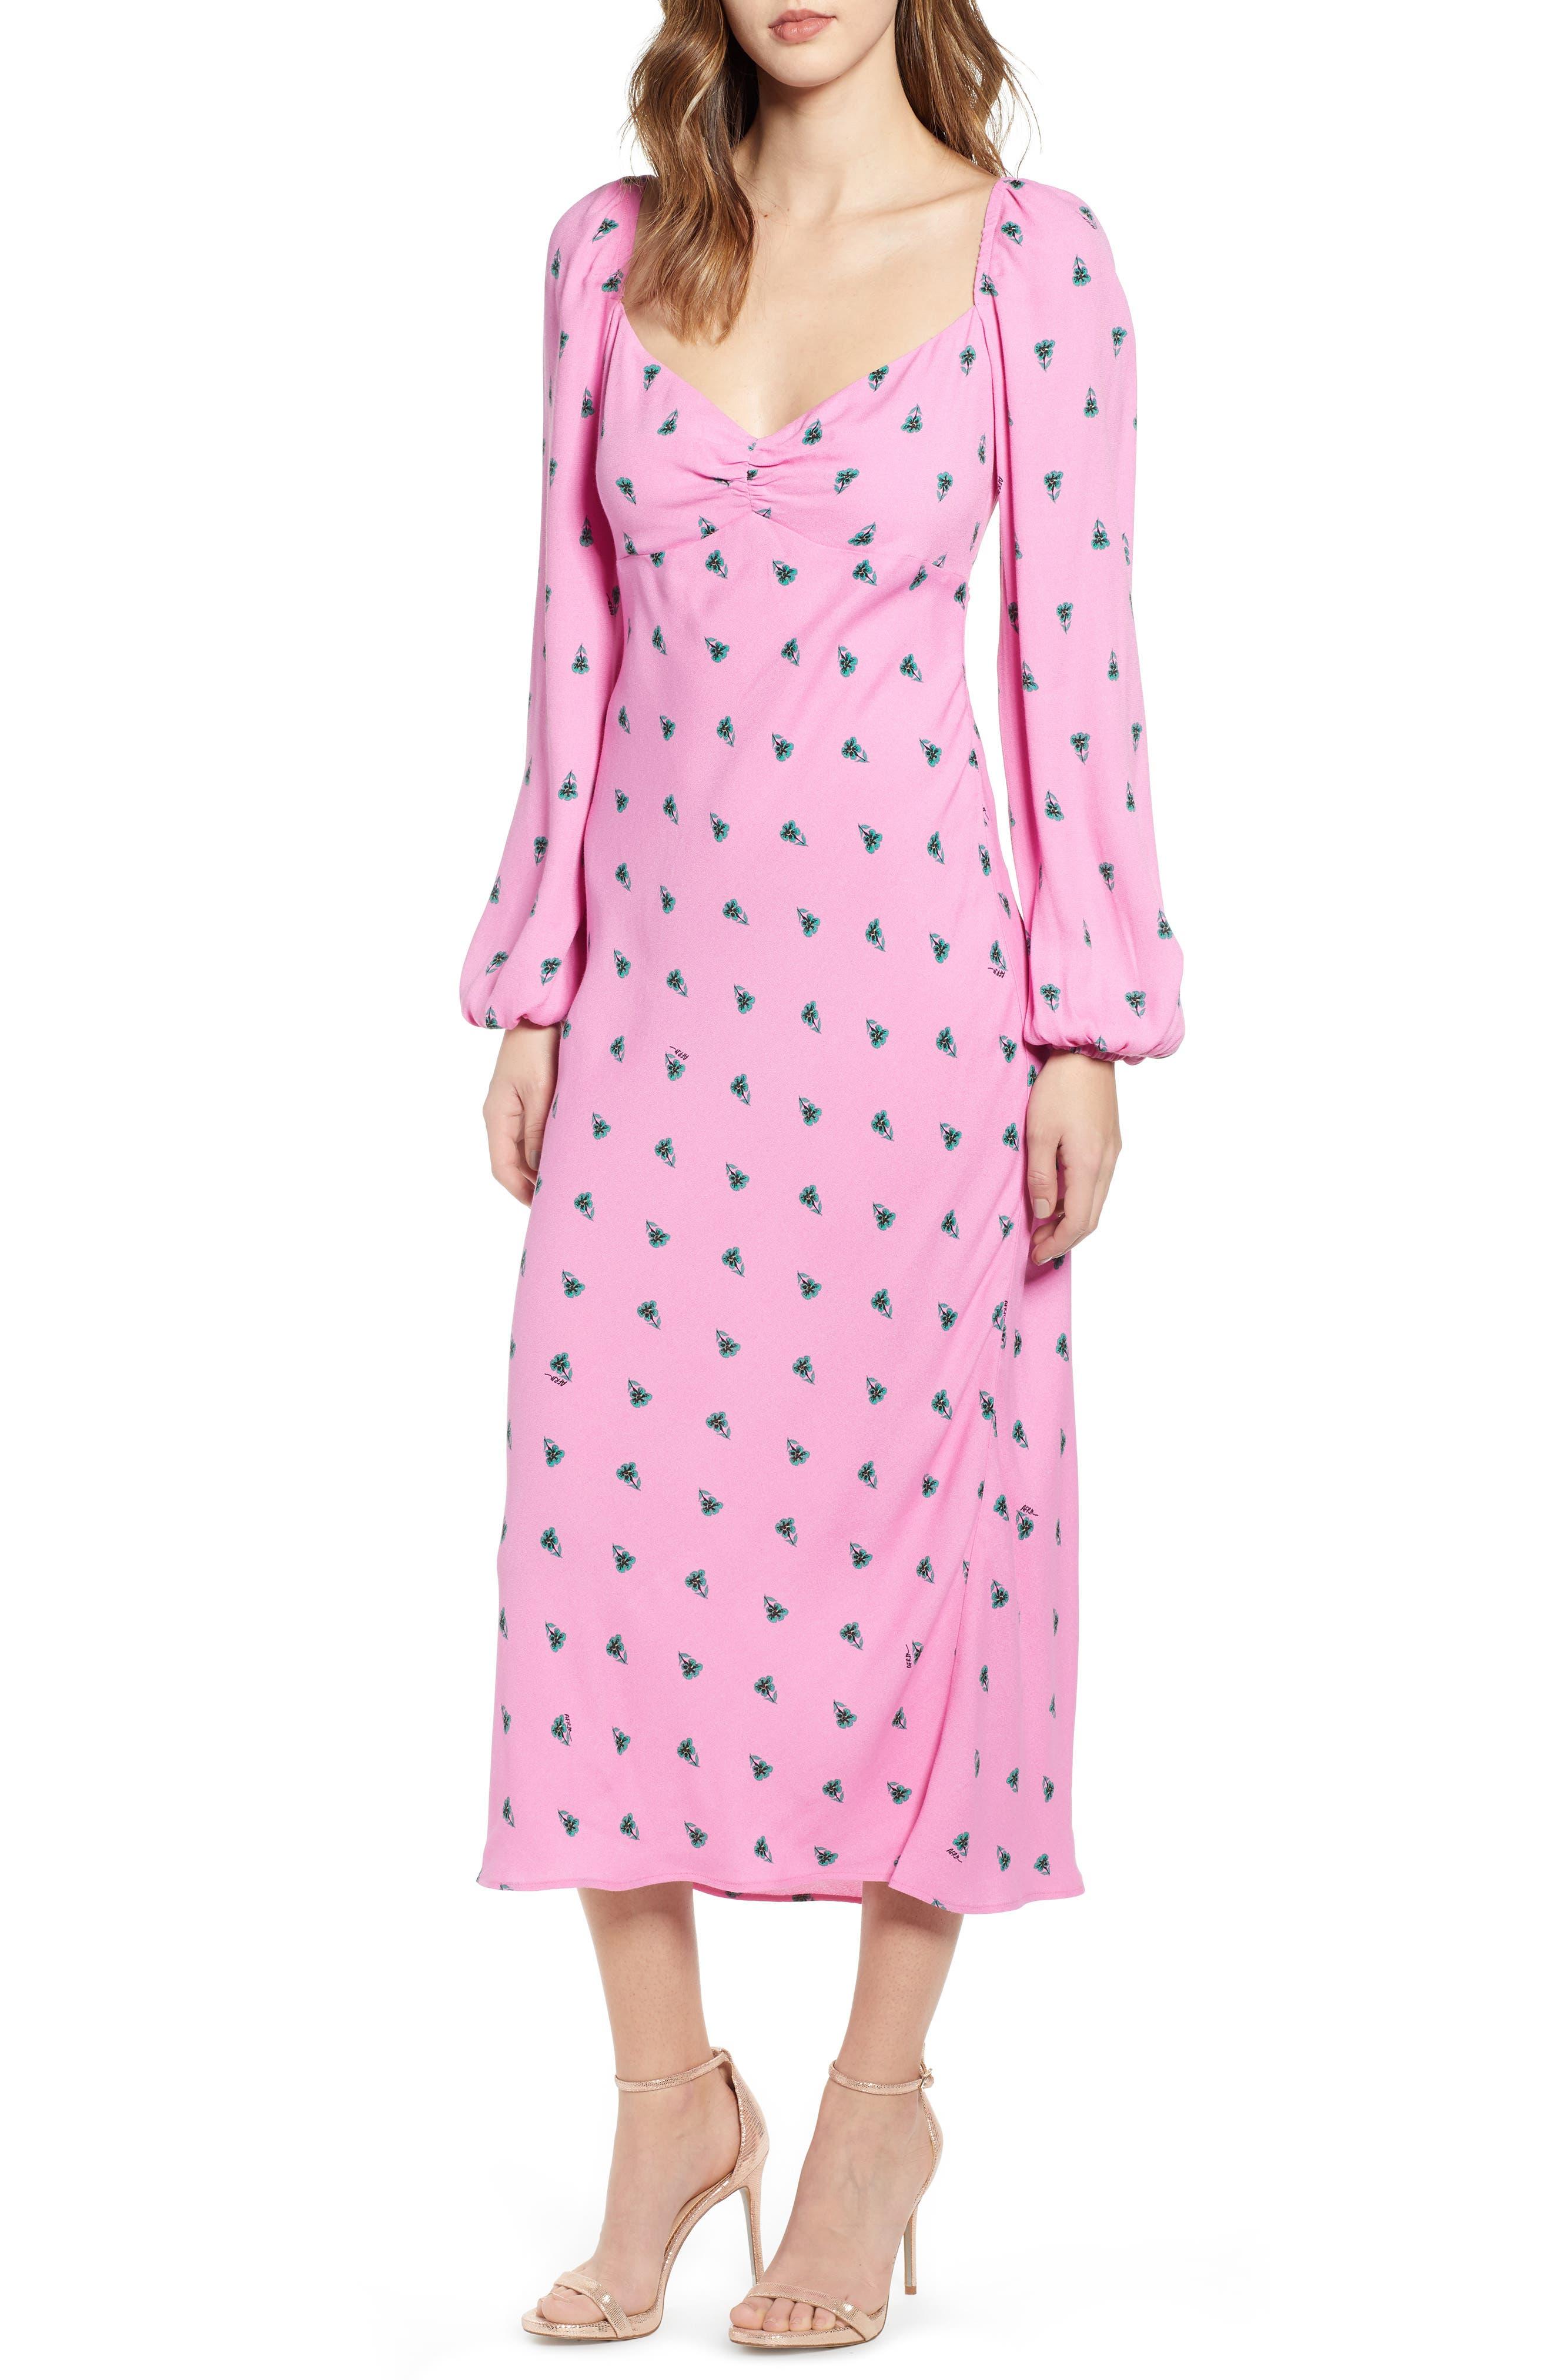 Afrm Trixie Balloon Sleeve Midi Dress, Pink